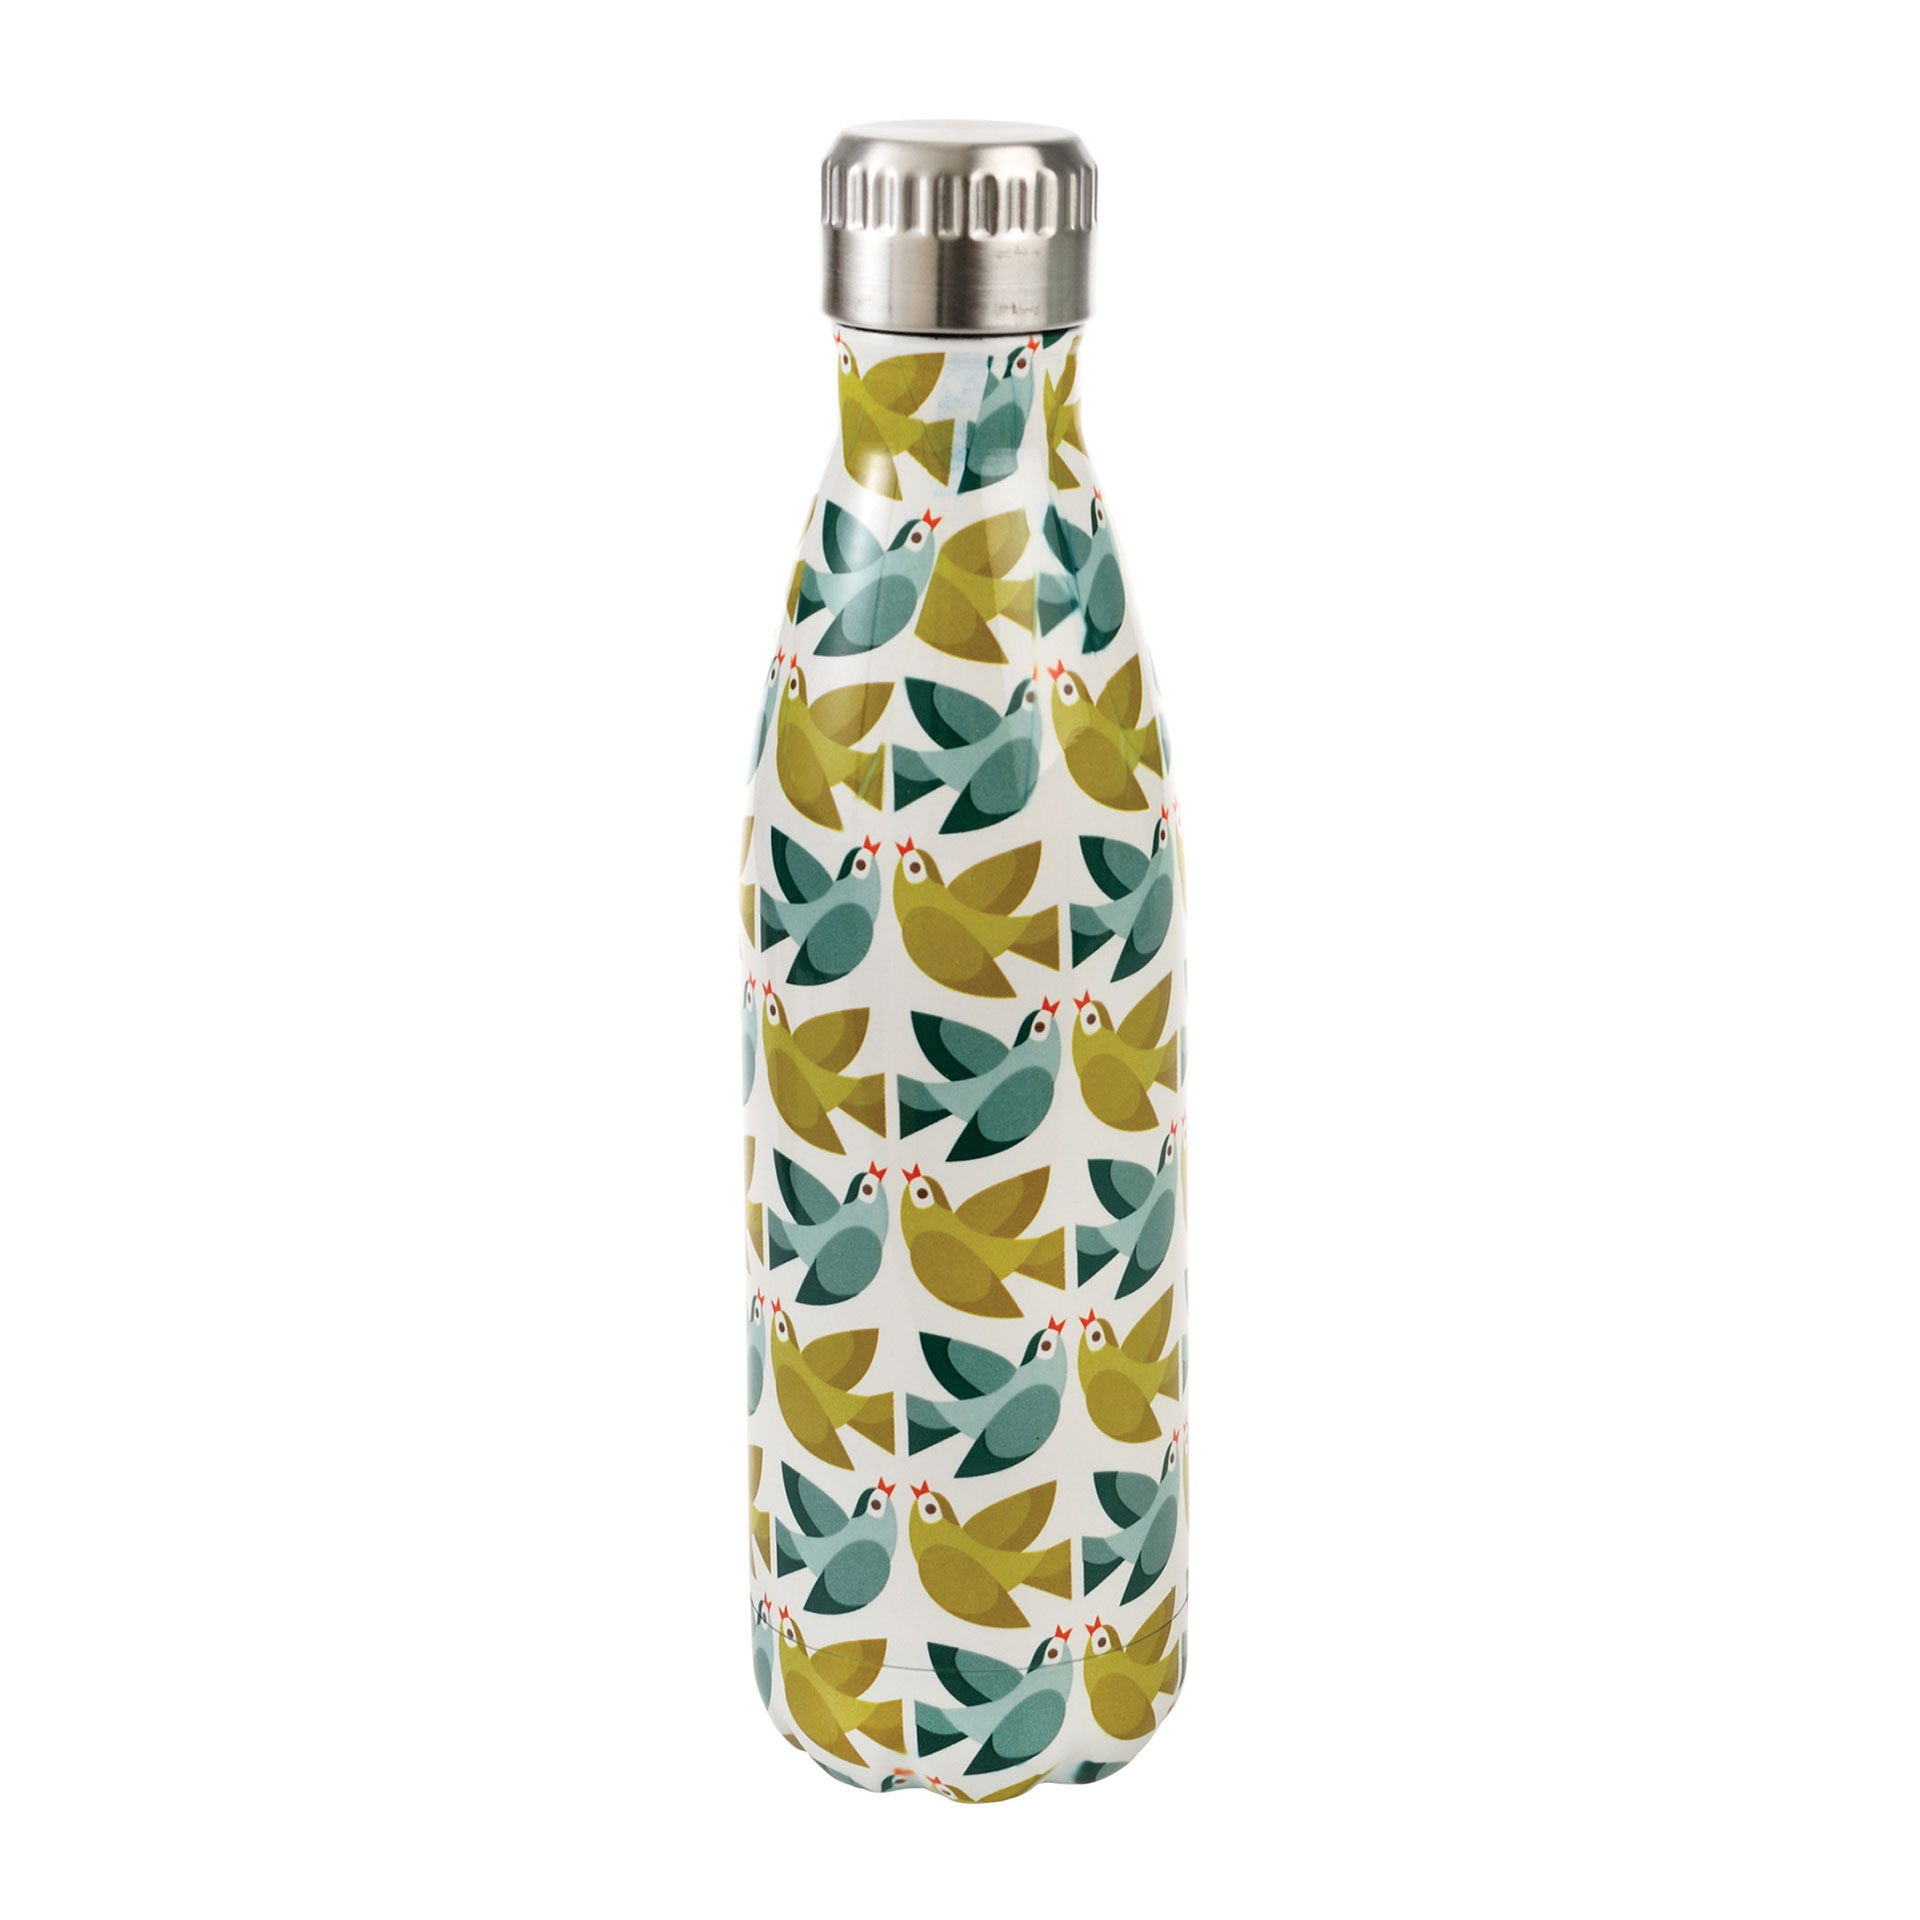 LEOKA Rex London Edelstahl-Flasche love birds